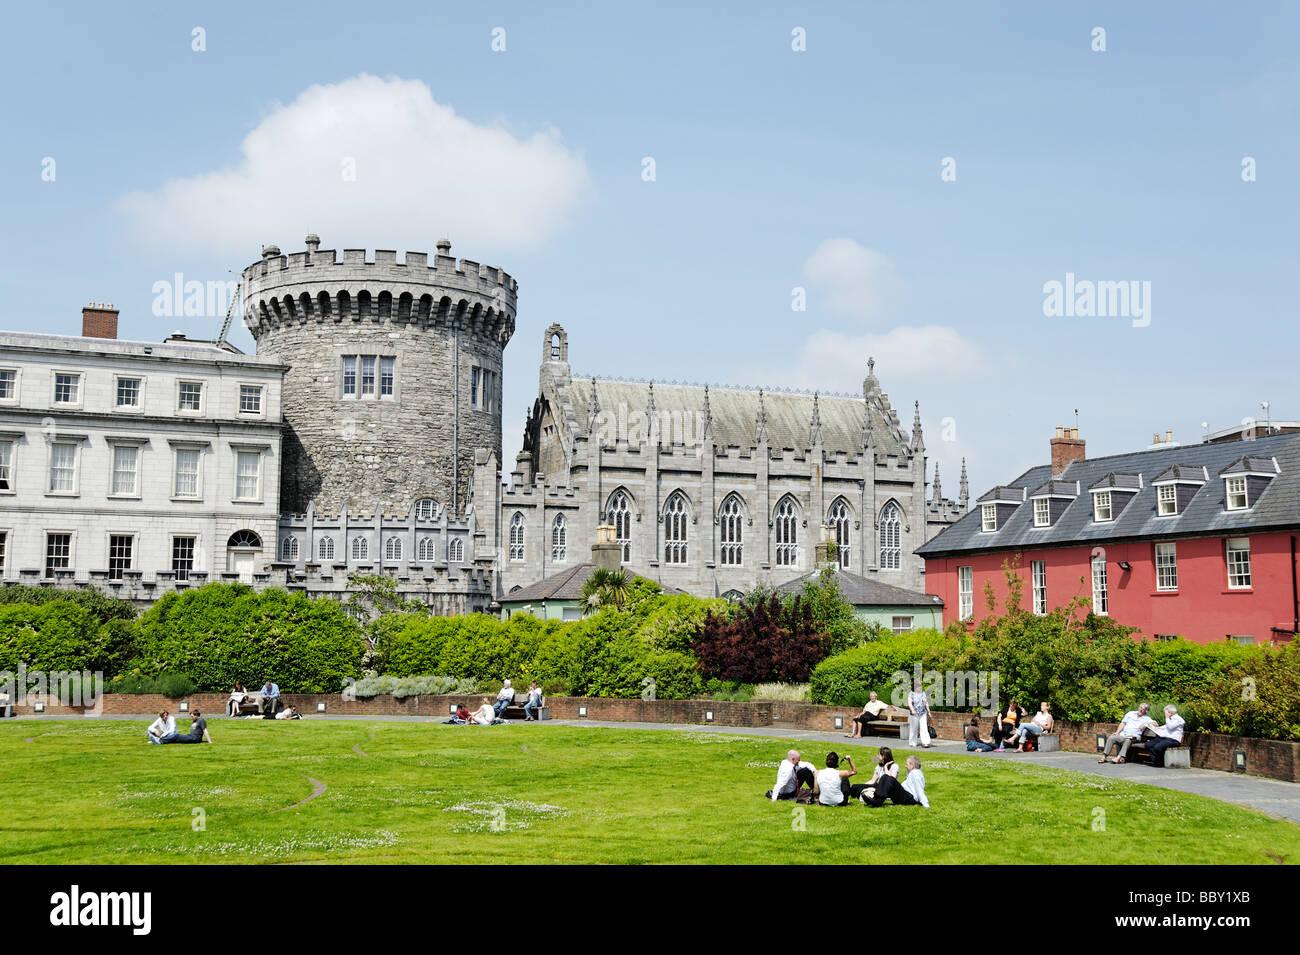 Overlooking Dublinn Garden to Record Tower at Dublin Castle Dublin Republic of Ireland - Stock Image